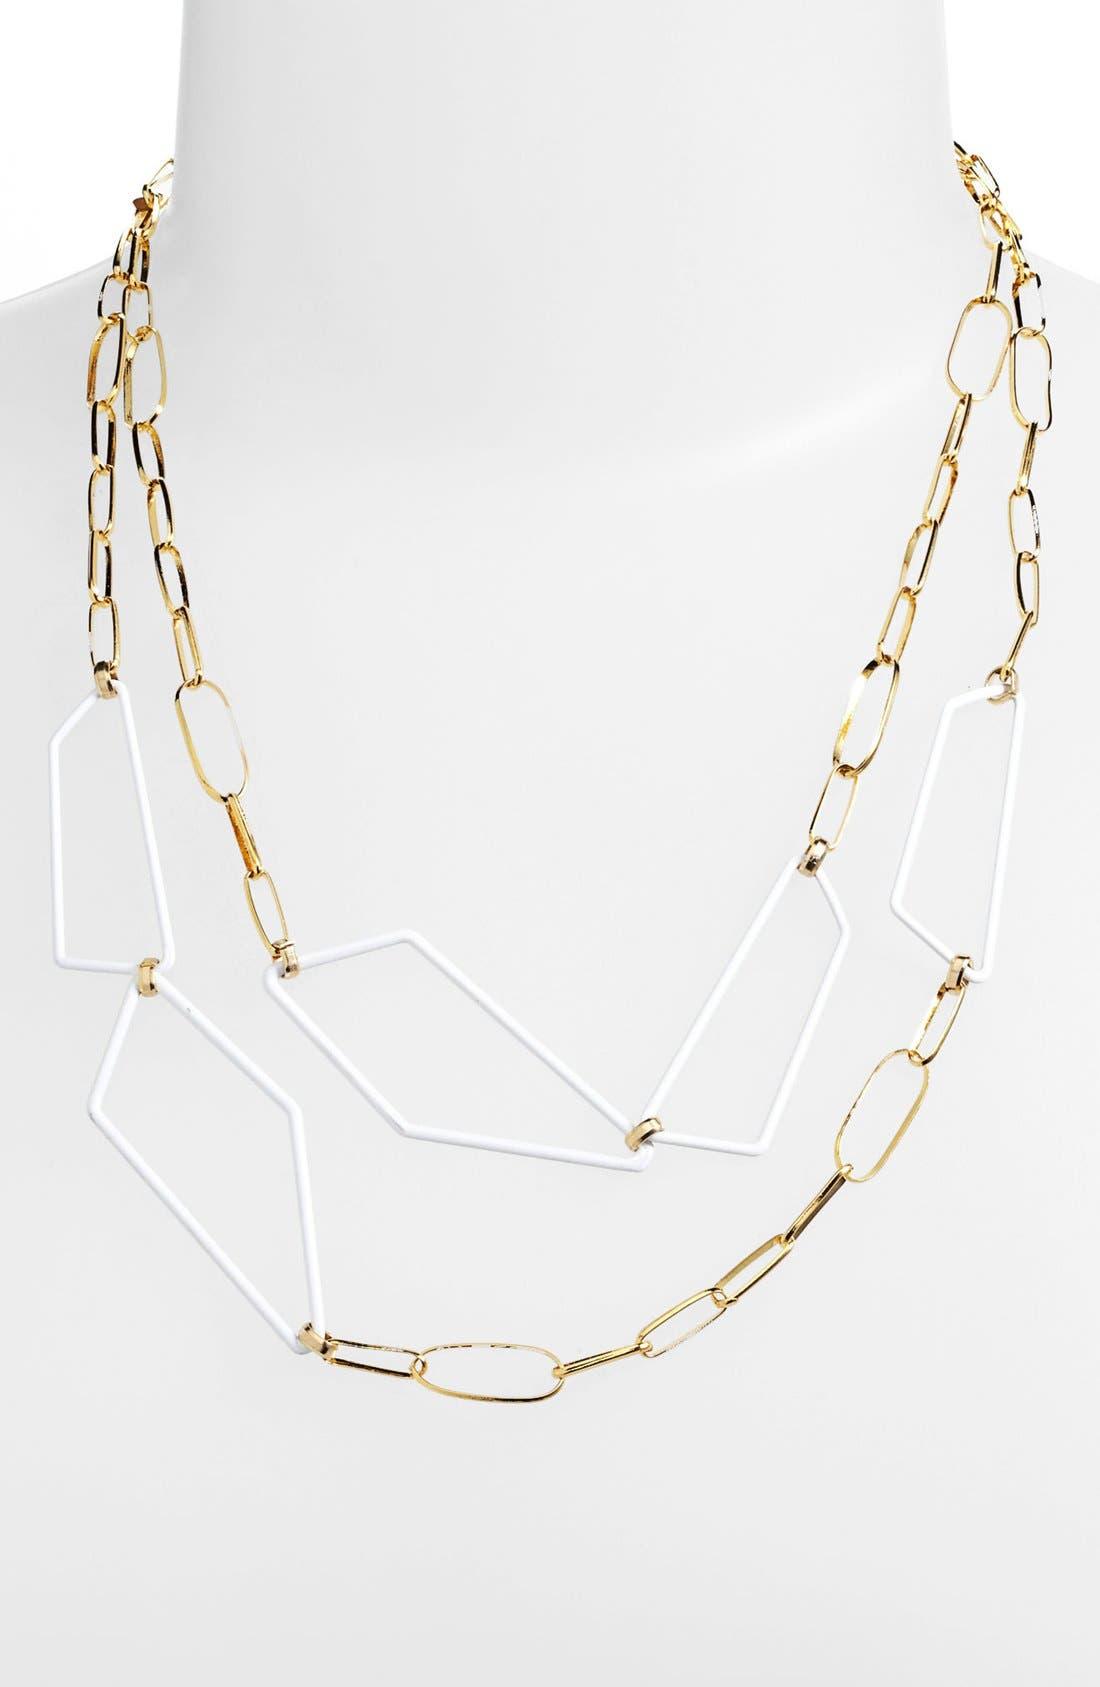 Main Image - Alexis Bittar 'Miss Havisham - Liquid Gold' Multistrand Link Necklace